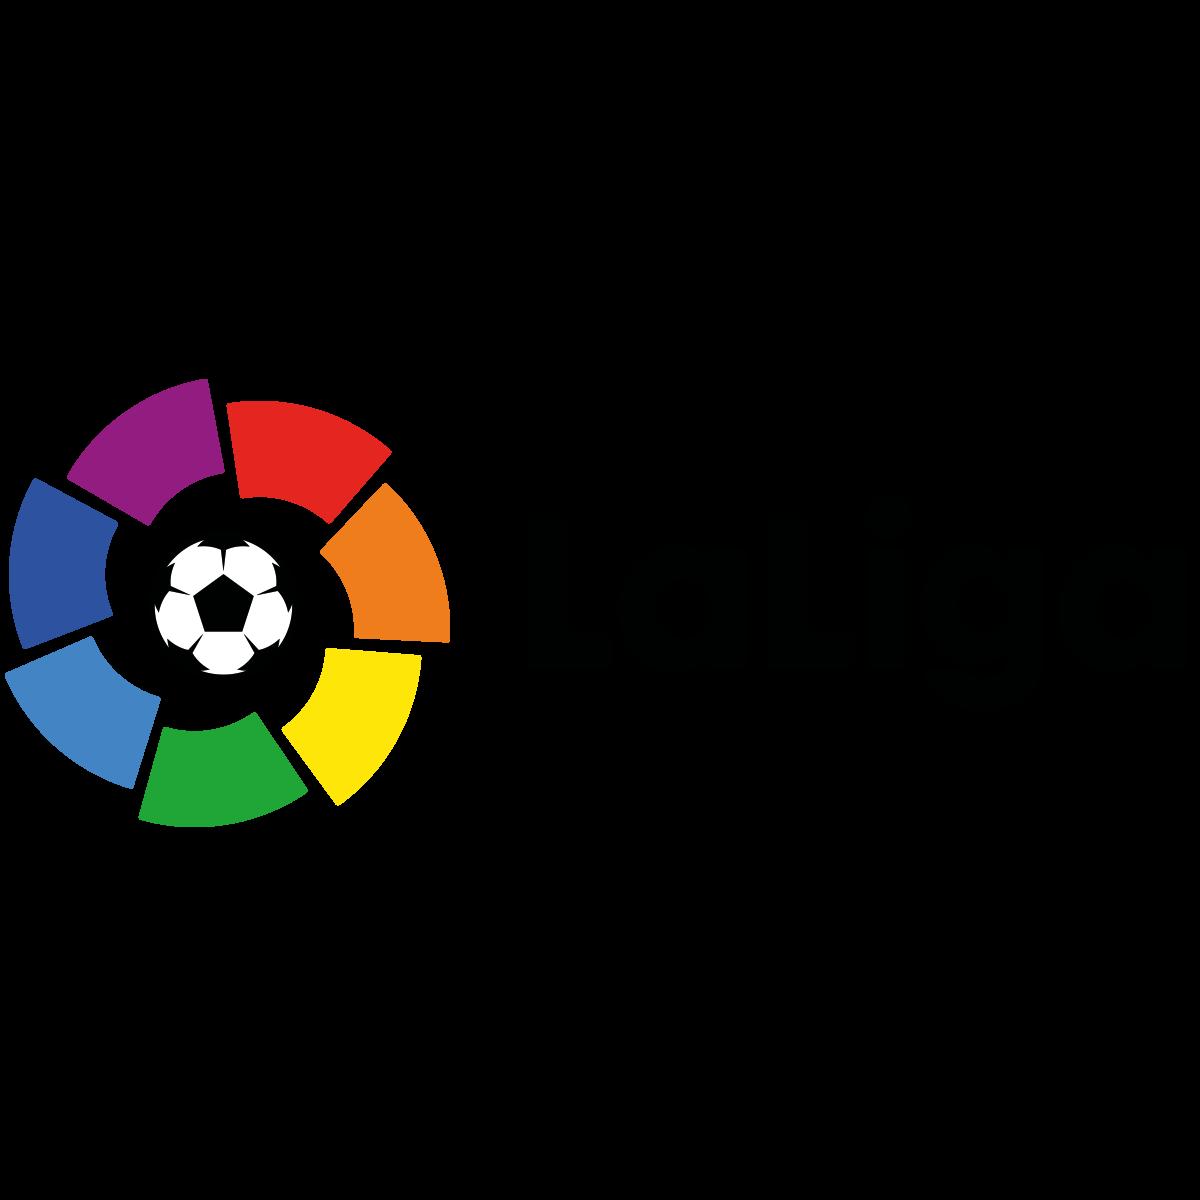 LIGA logo